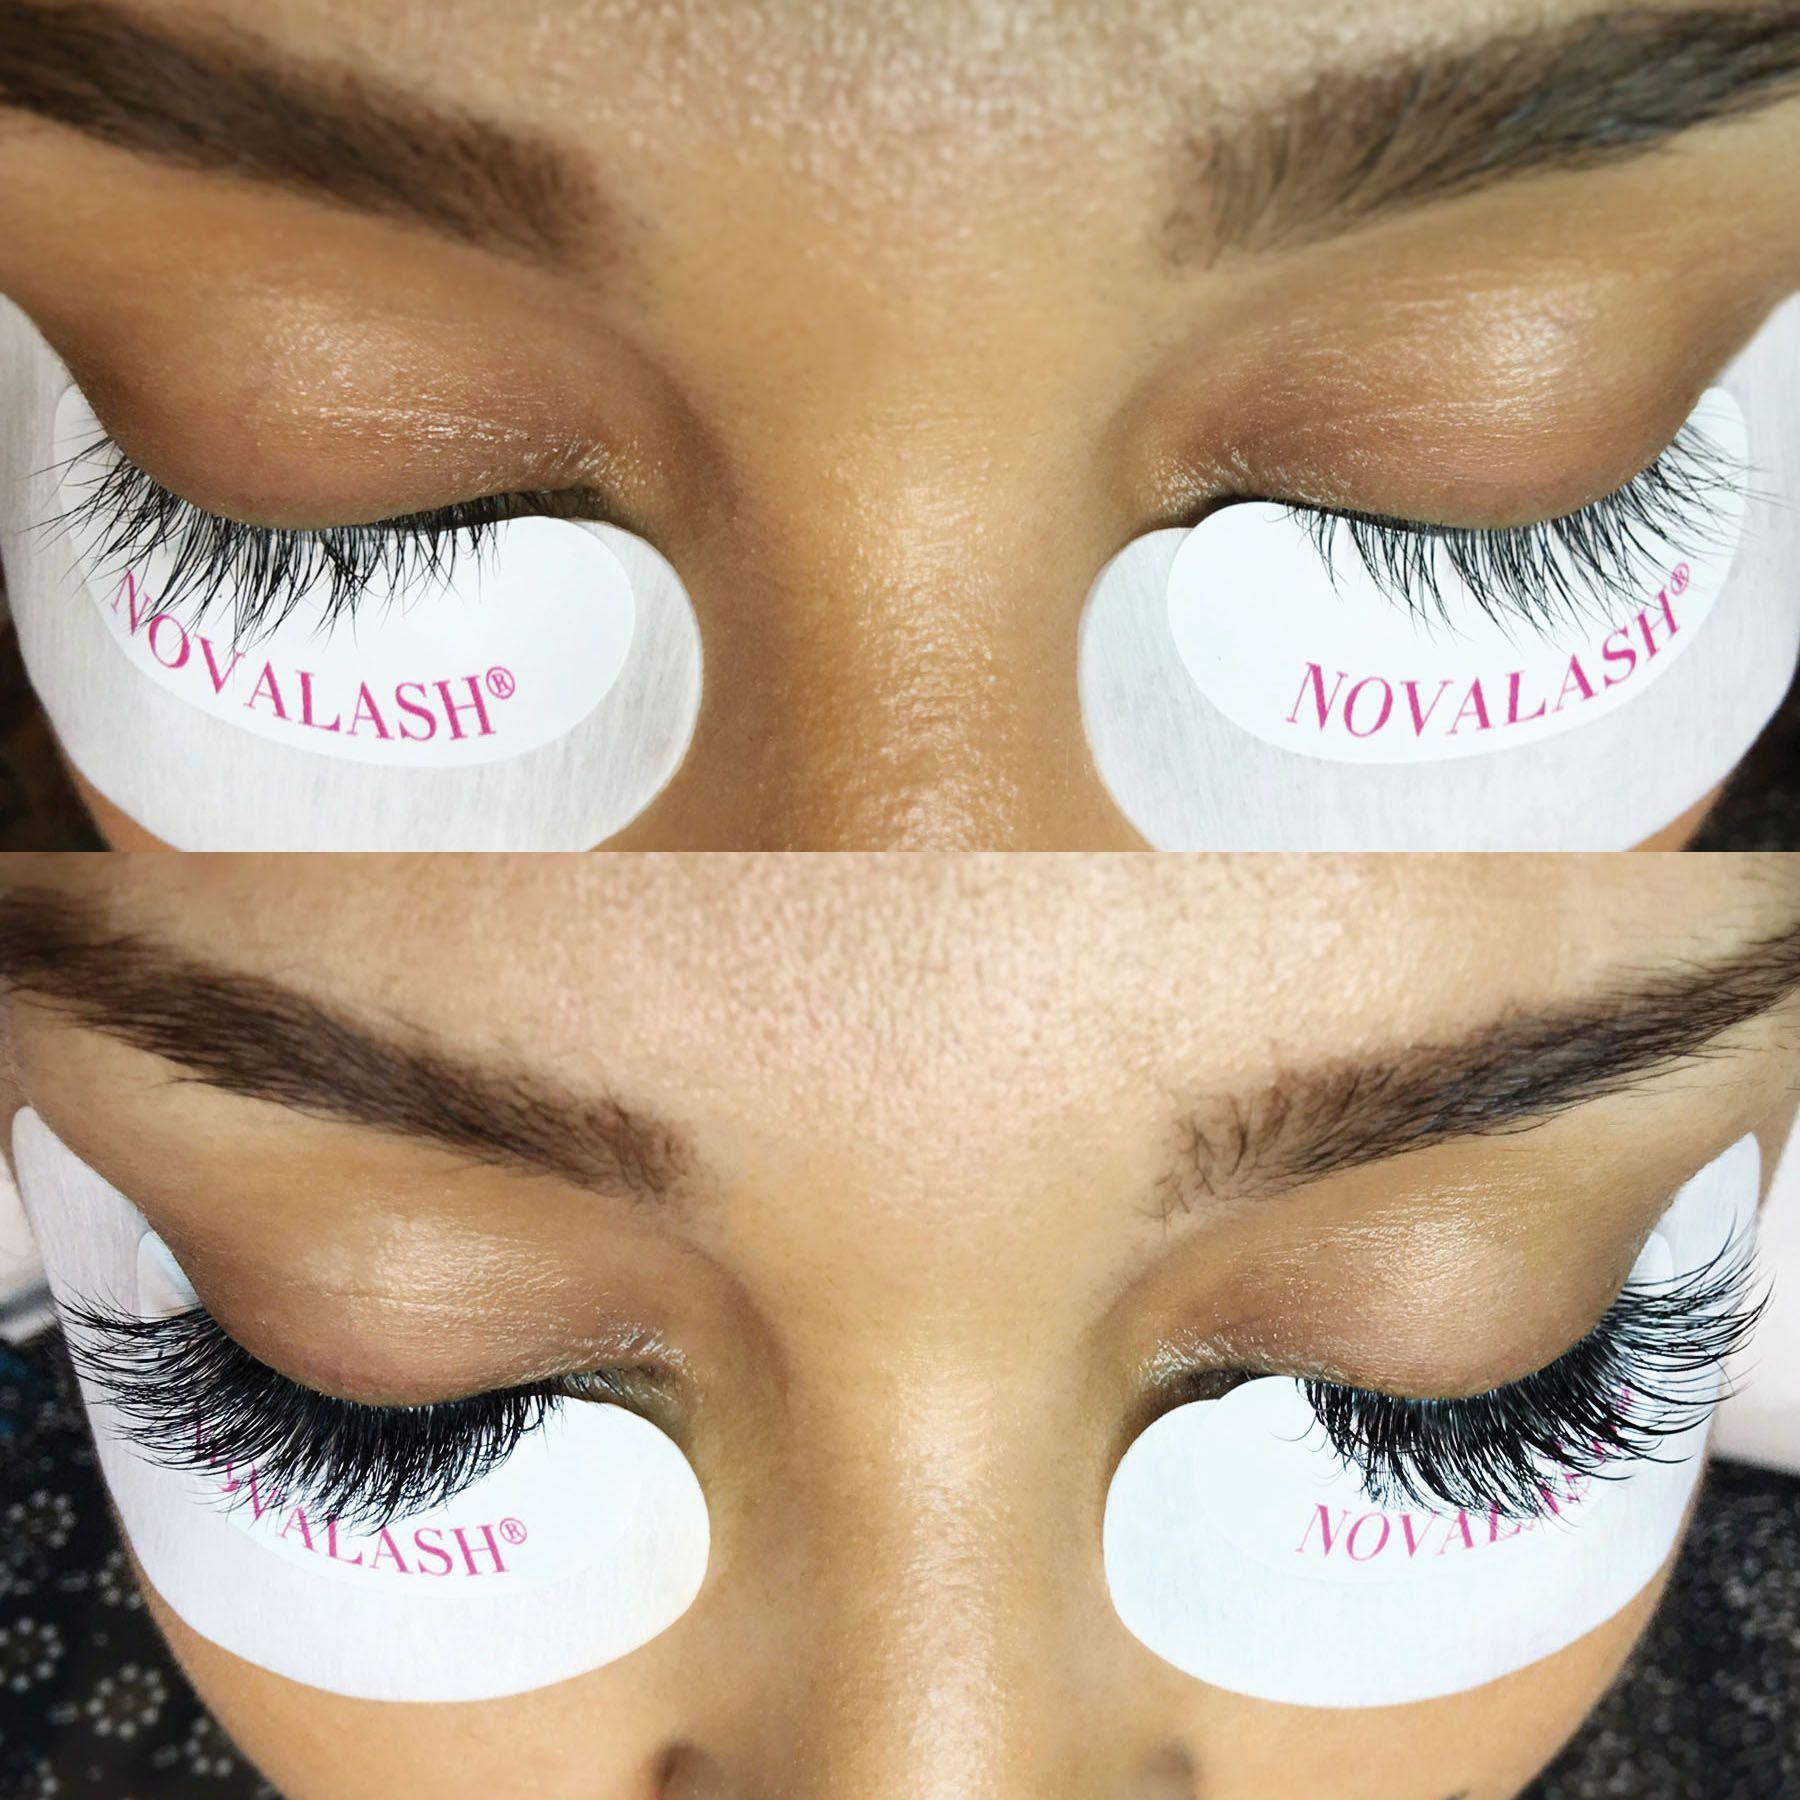 Skin Care Tips For Beautiful Skin Novalash eyelash